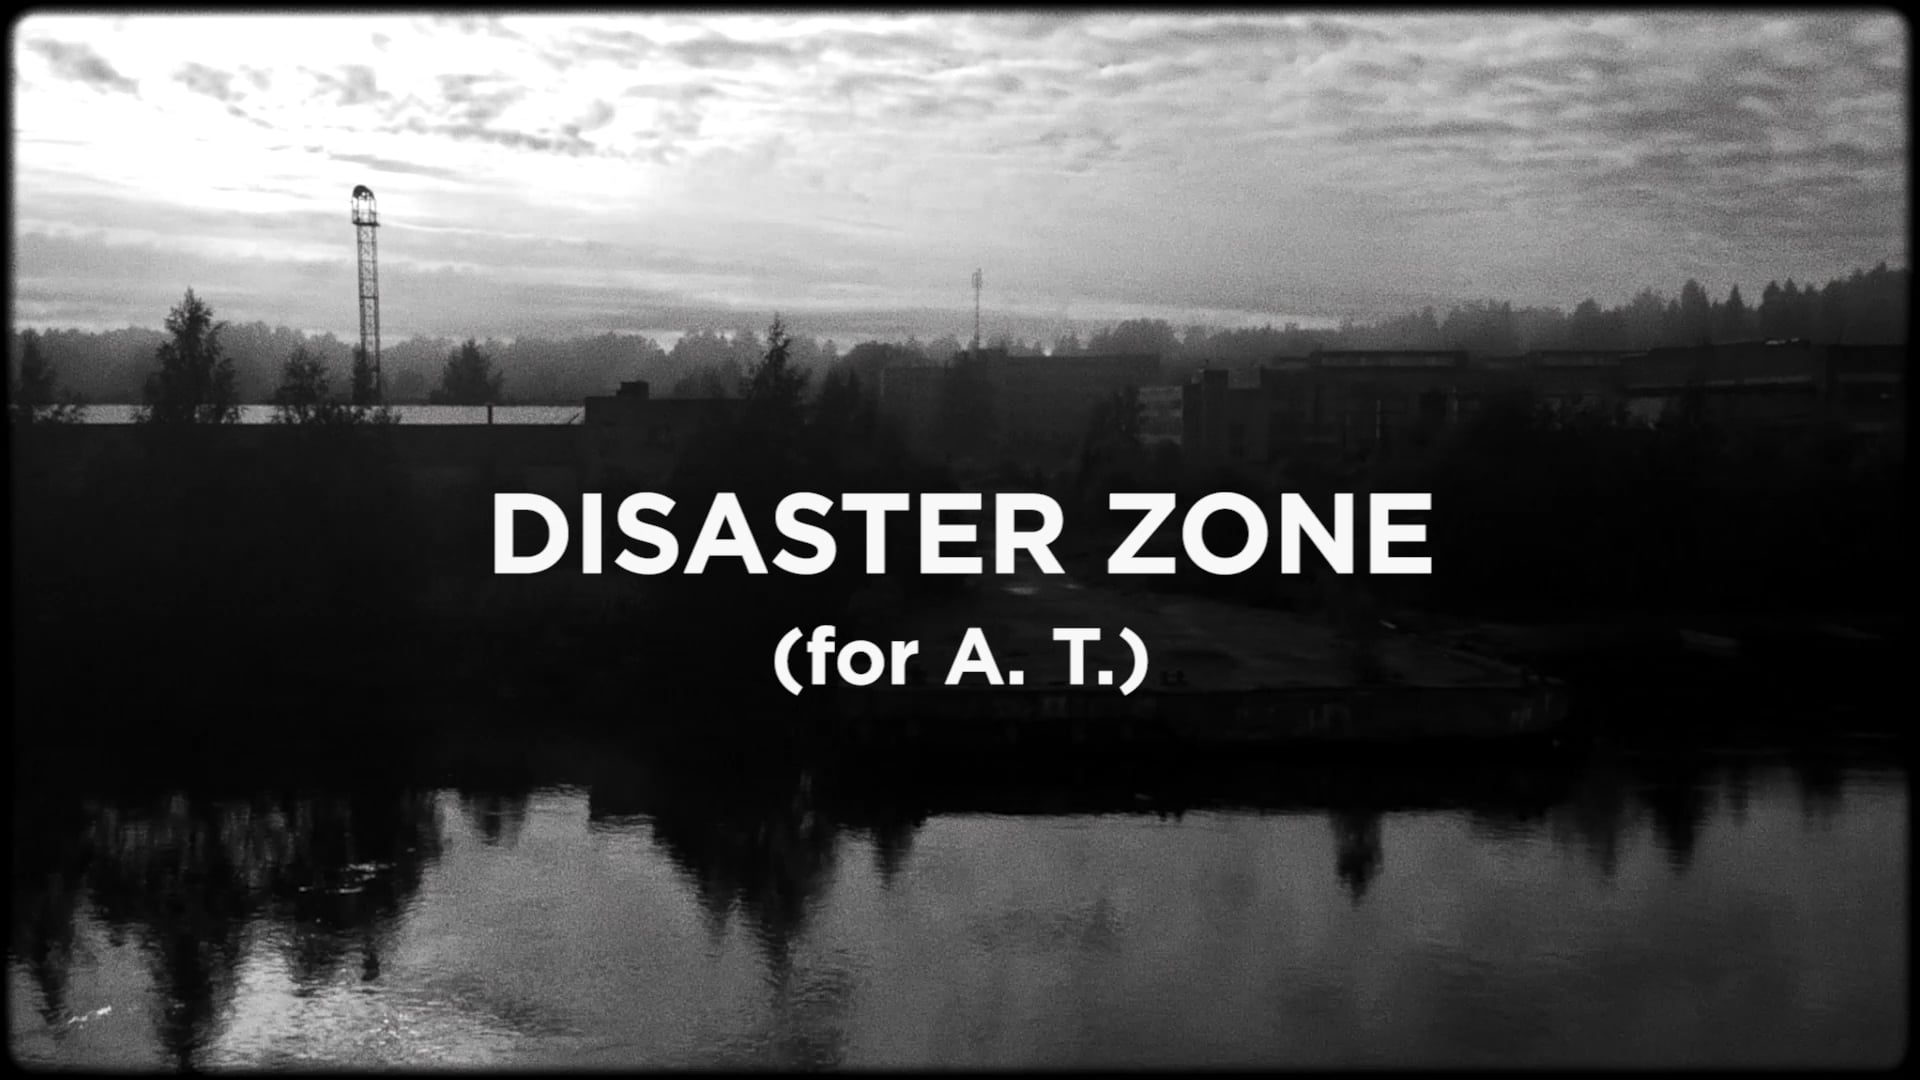 DISASTER ZONE / TRAILER